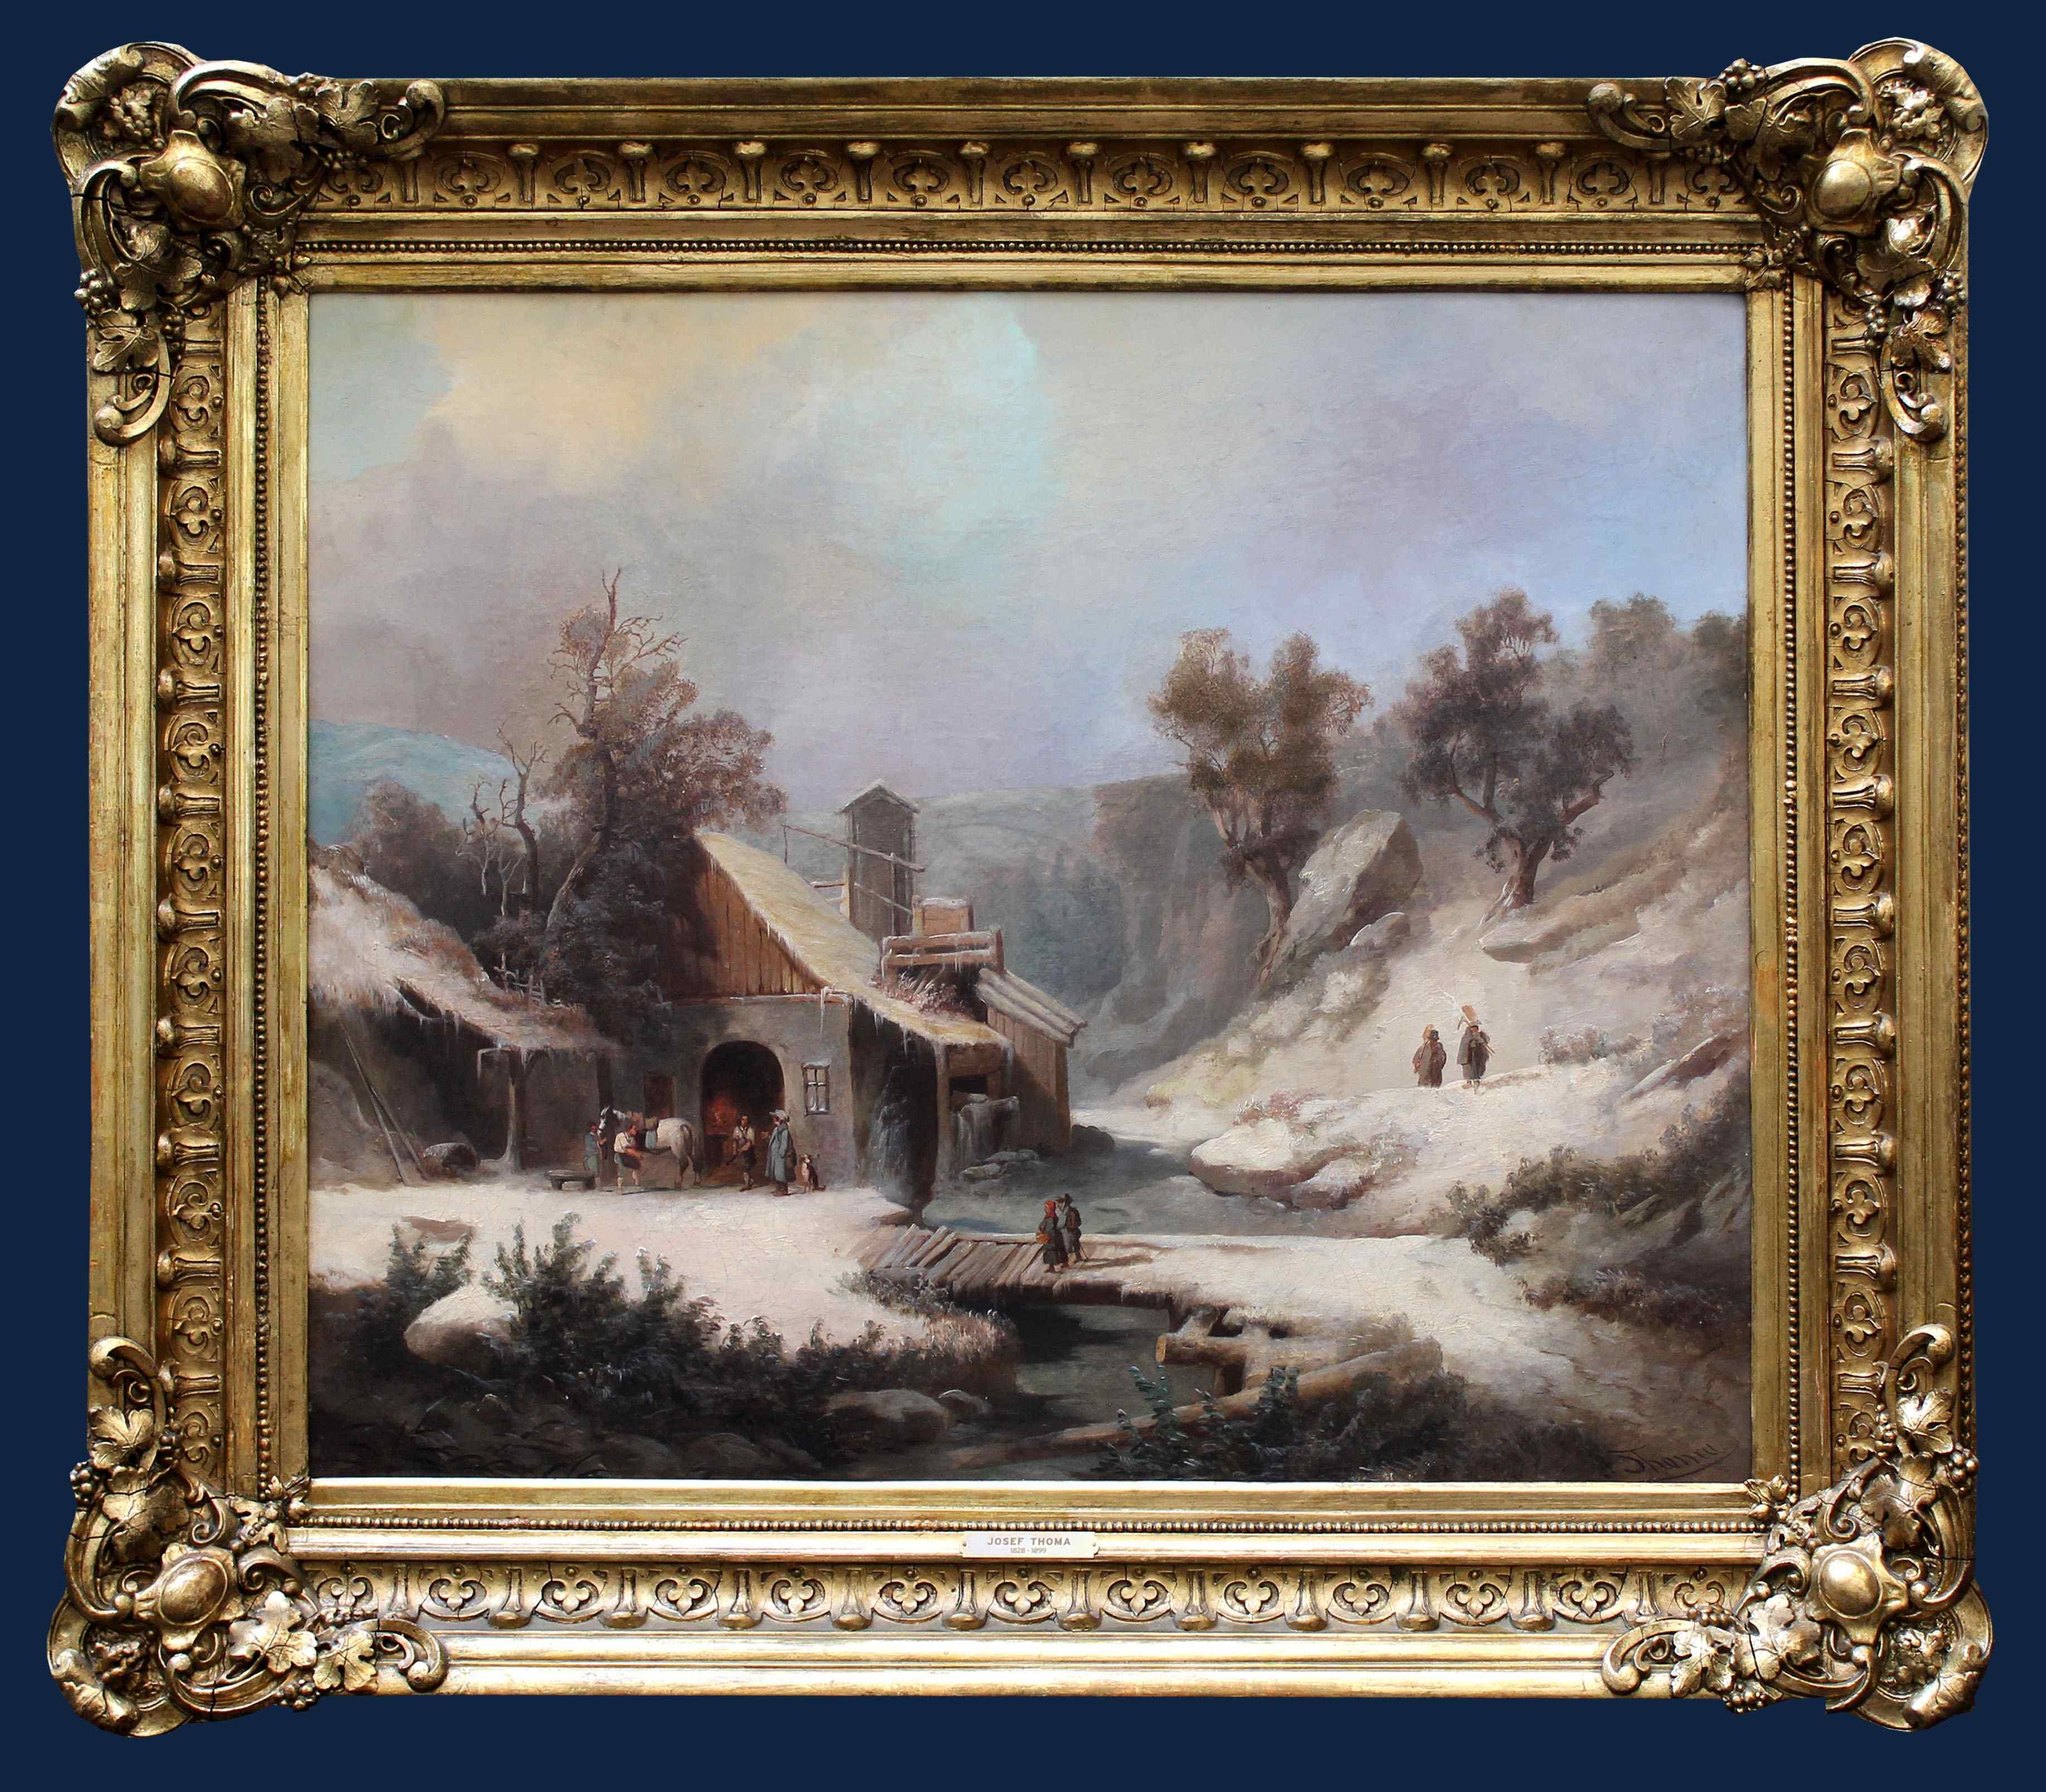 Josef Thoma (1828 - 1899), Paysage d'hiver, Peinture